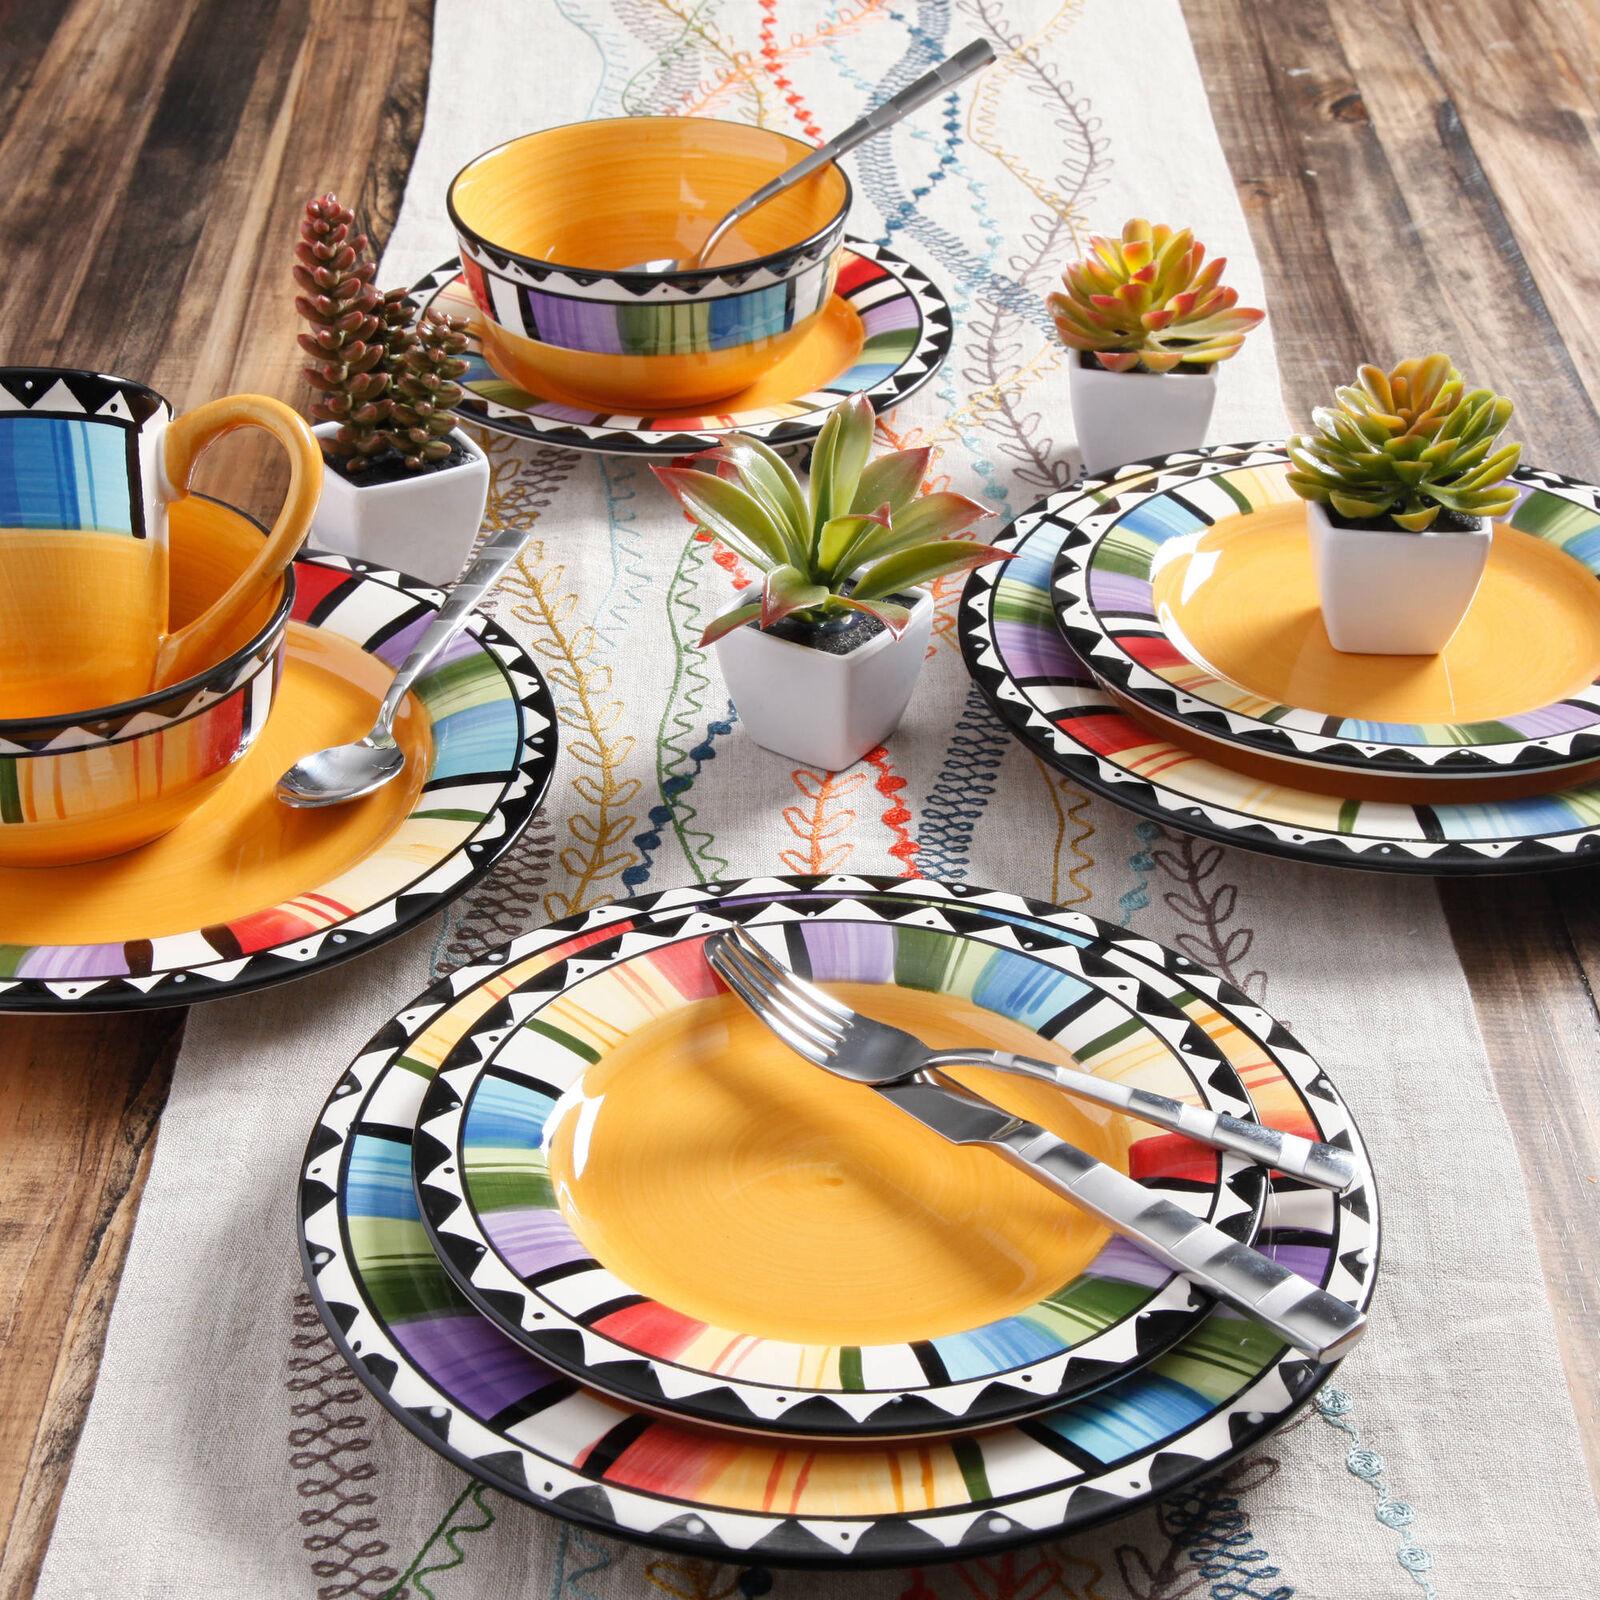 Fiesta Dinnerware Set 16 PC Vaisselle assiette bol mug en grès cuisine salle à manger de la salade